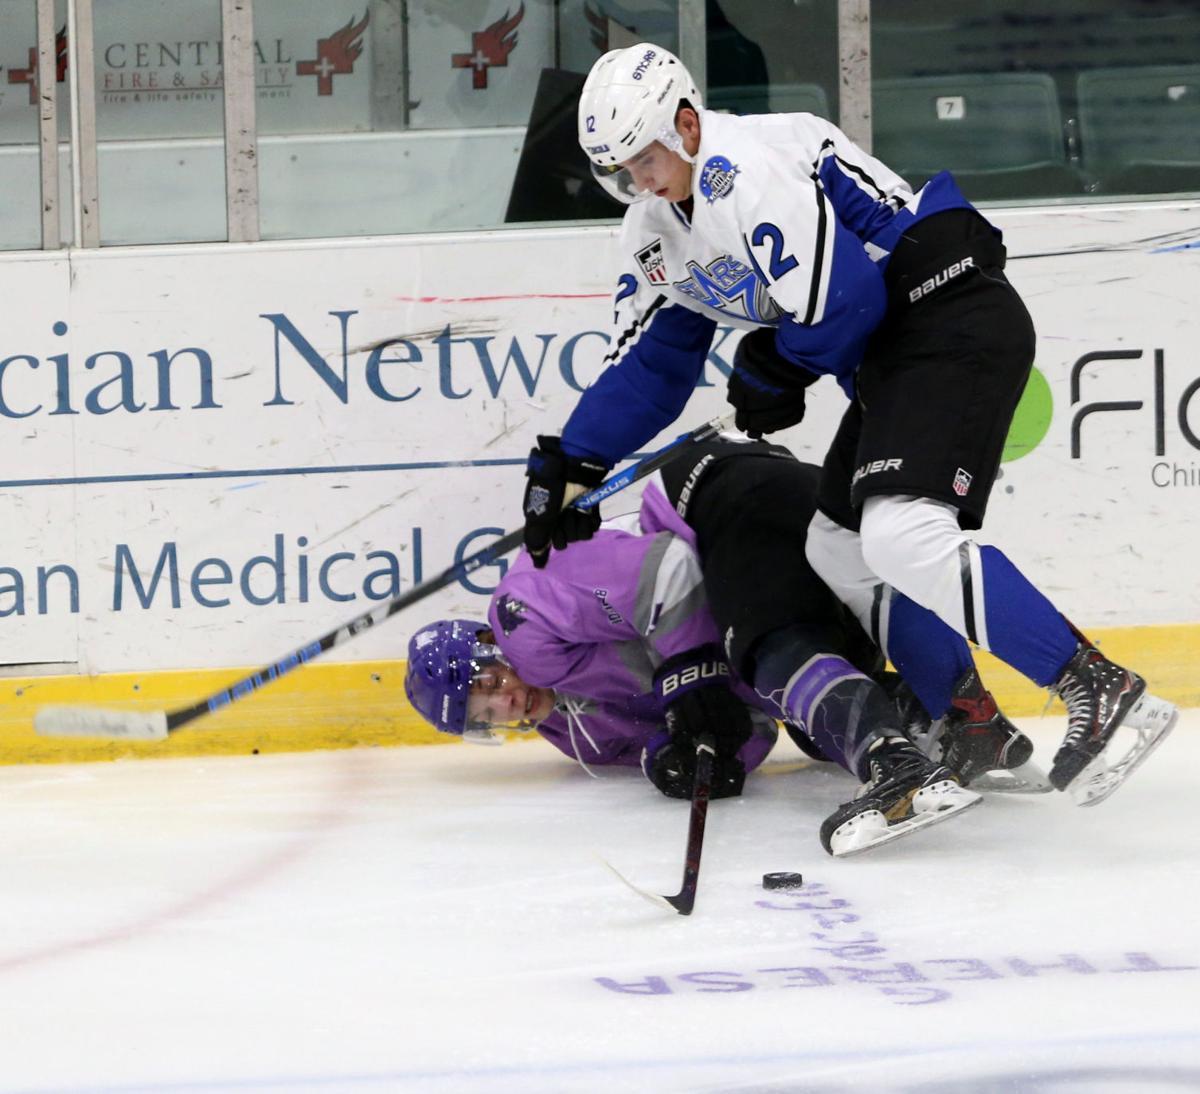 10-16-18 Storm Hockey gallery02.JPG